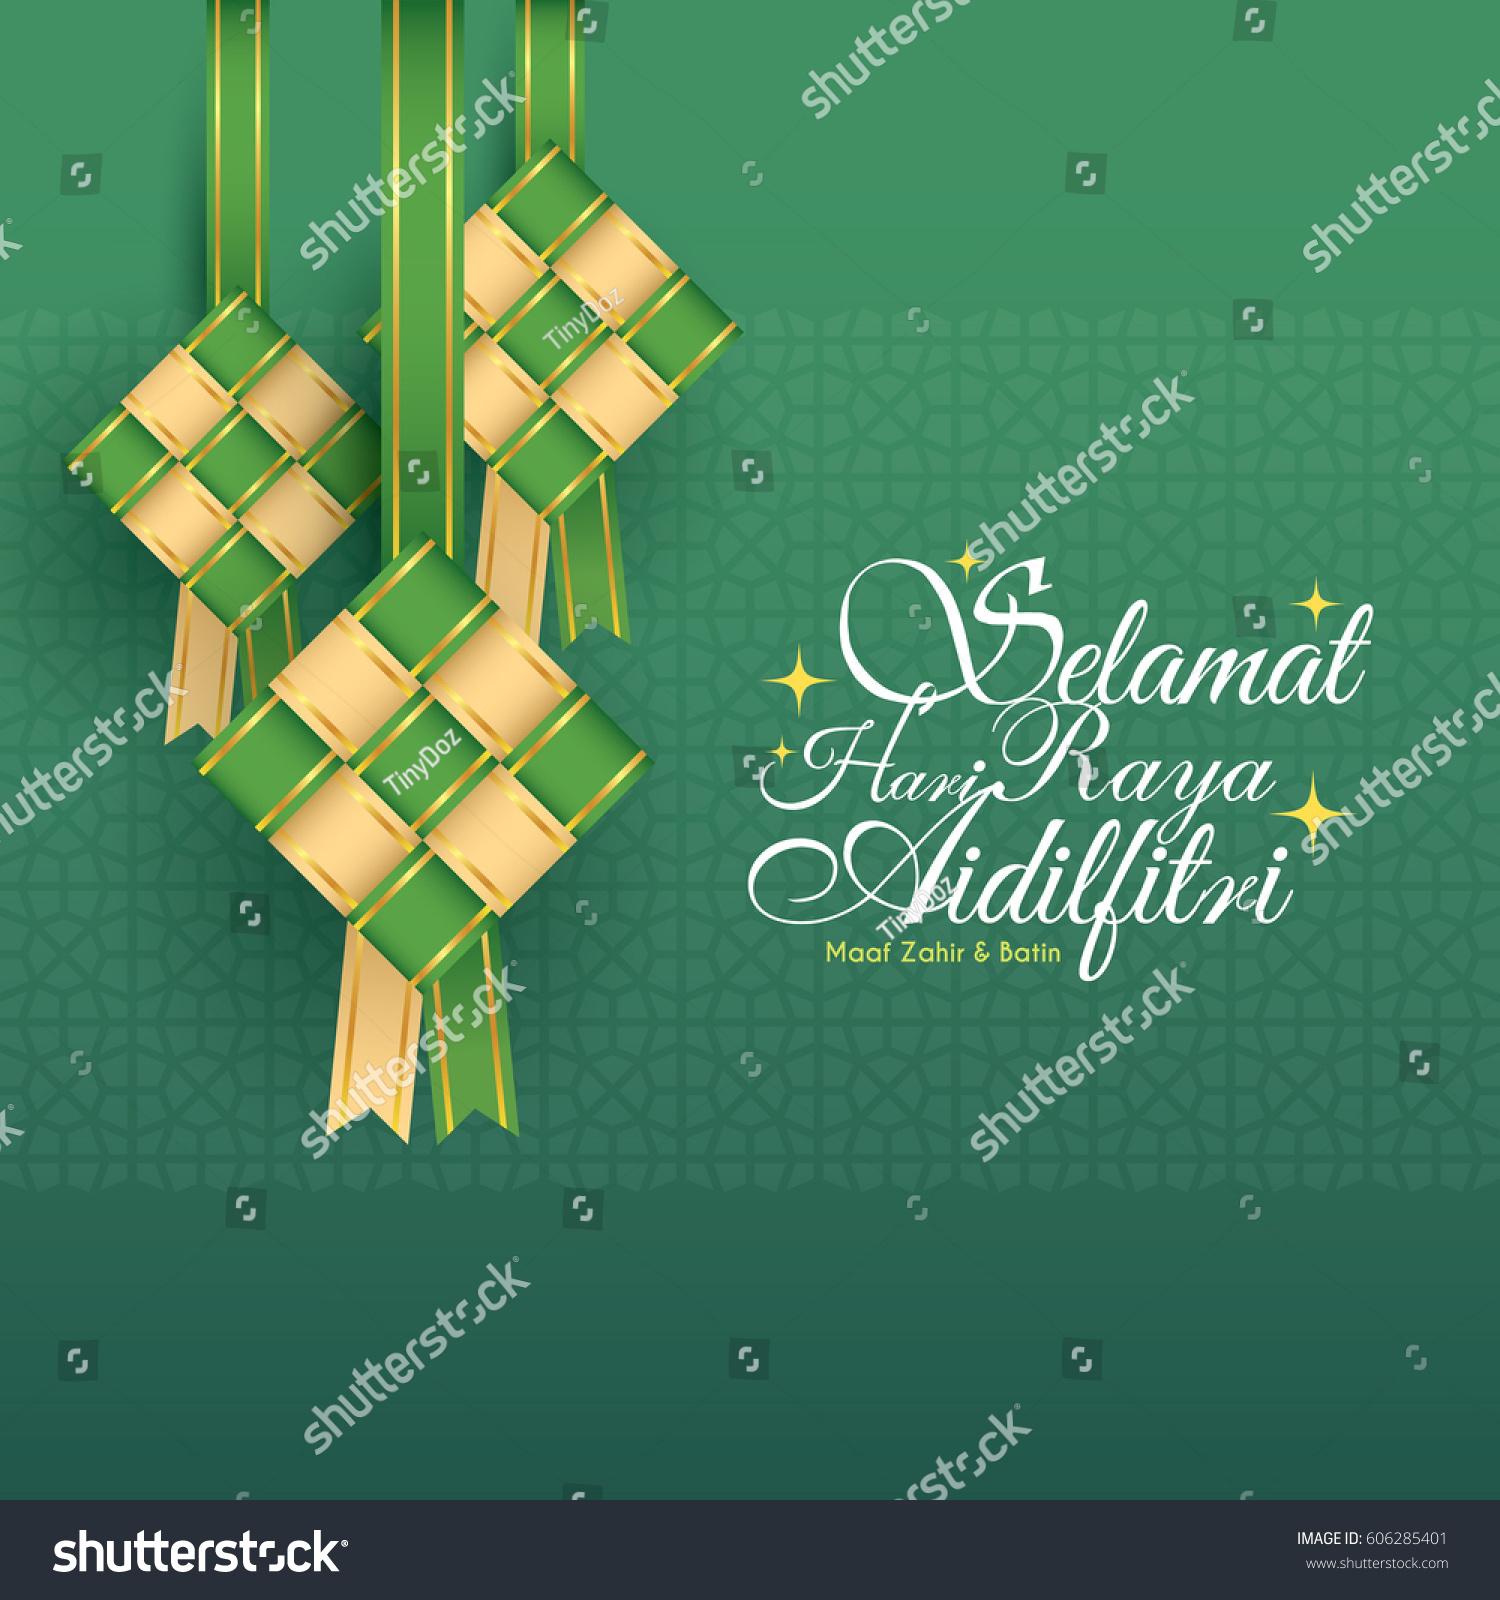 Selamat hari raya aidilfitri greeting card stock vector 606285401 selamat hari raya aidilfitri greeting card vector ketupat with islamic pattern as background kristyandbryce Images